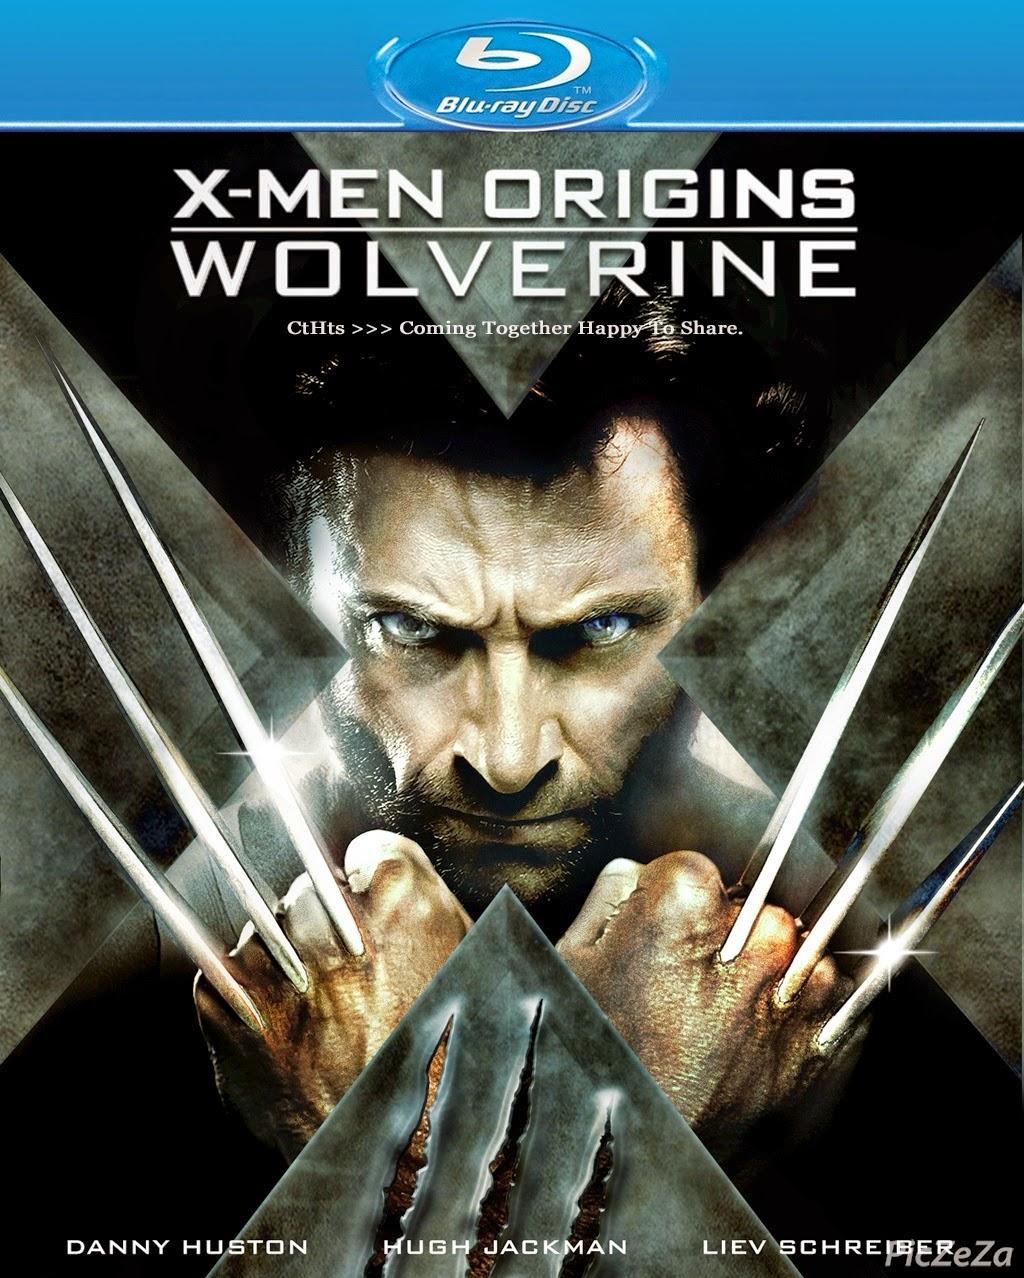 X-Men Origins : Wolverine (2009) กำเนิดวูล์ฟเวอรีน